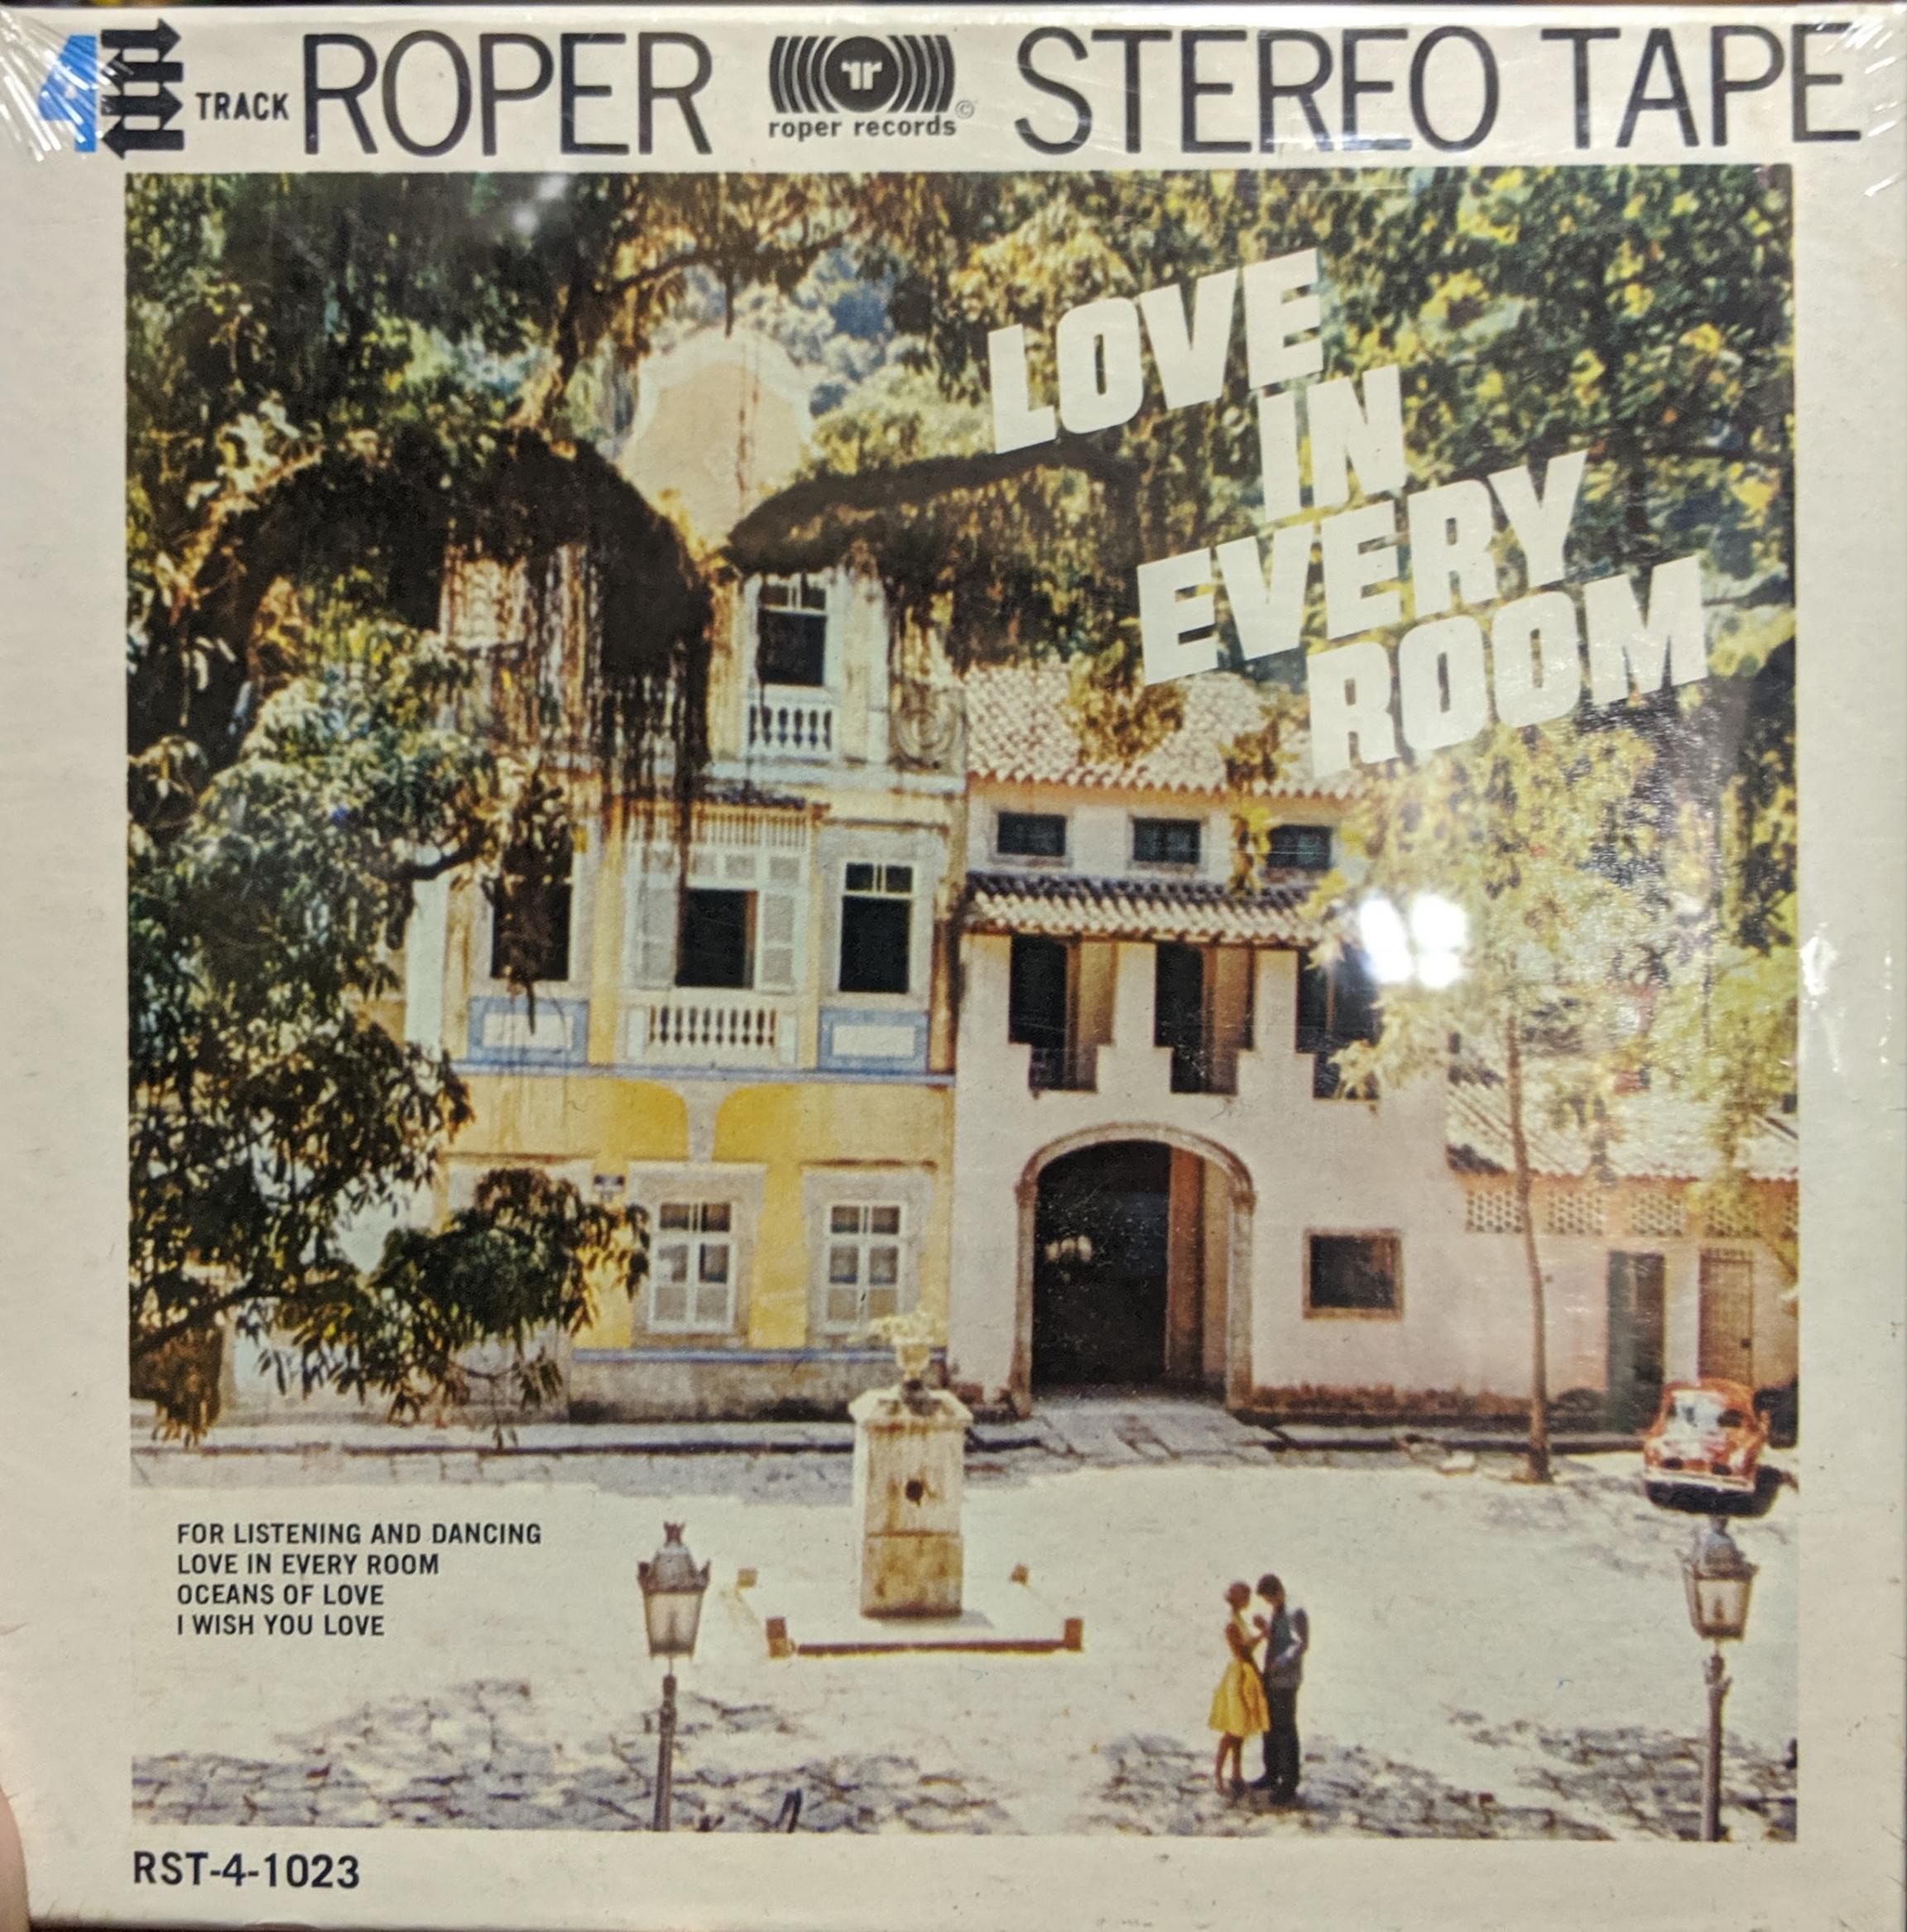 A Roper record